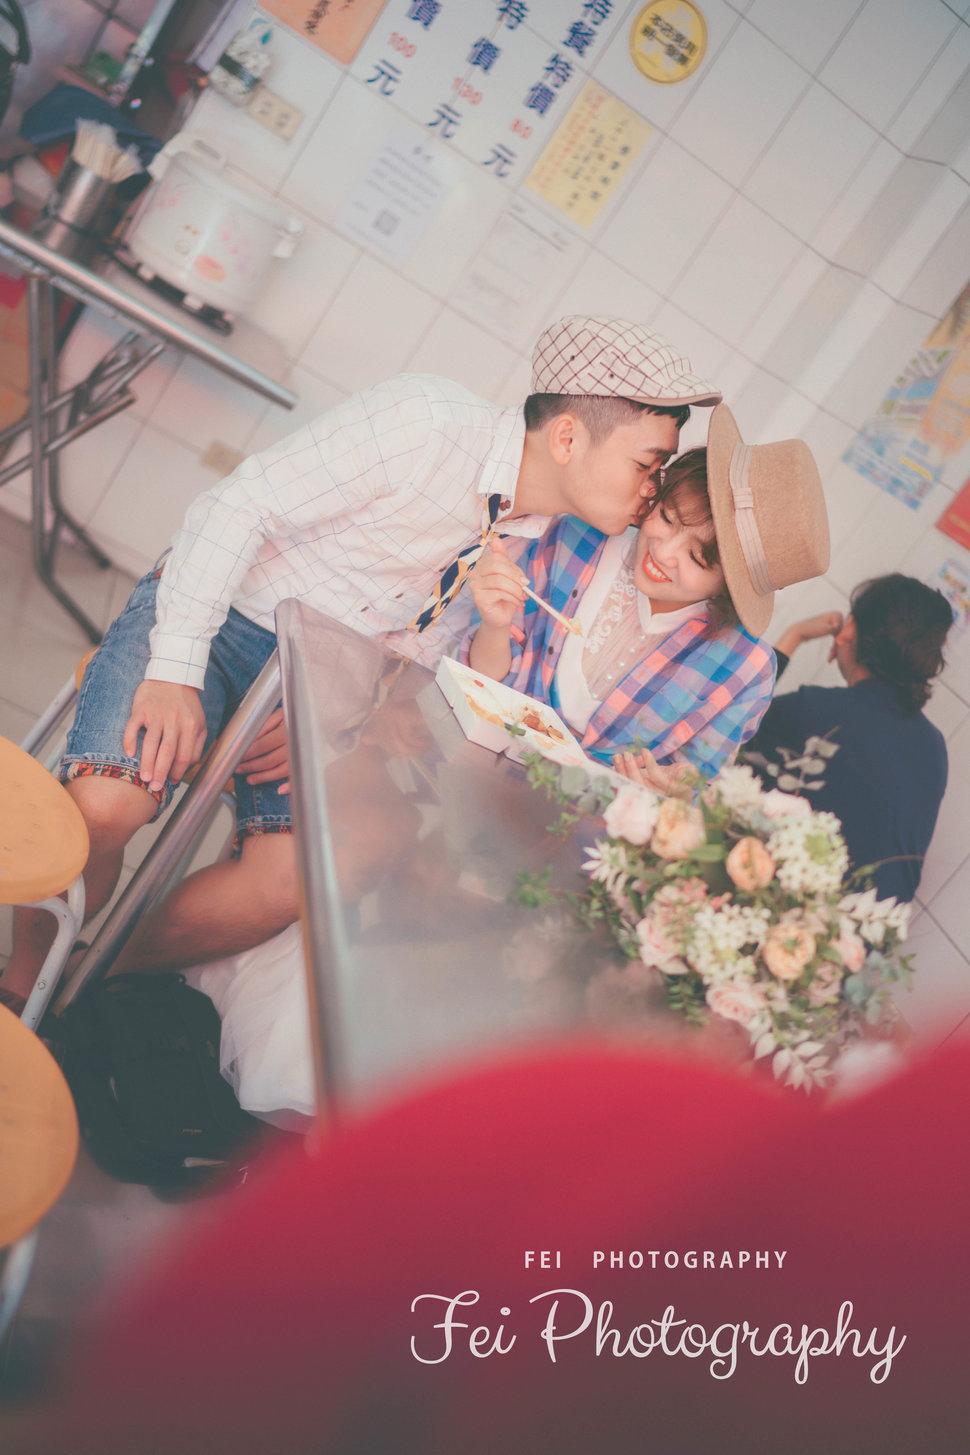 37 - 飛妃 Photography/女攝影師《結婚吧》